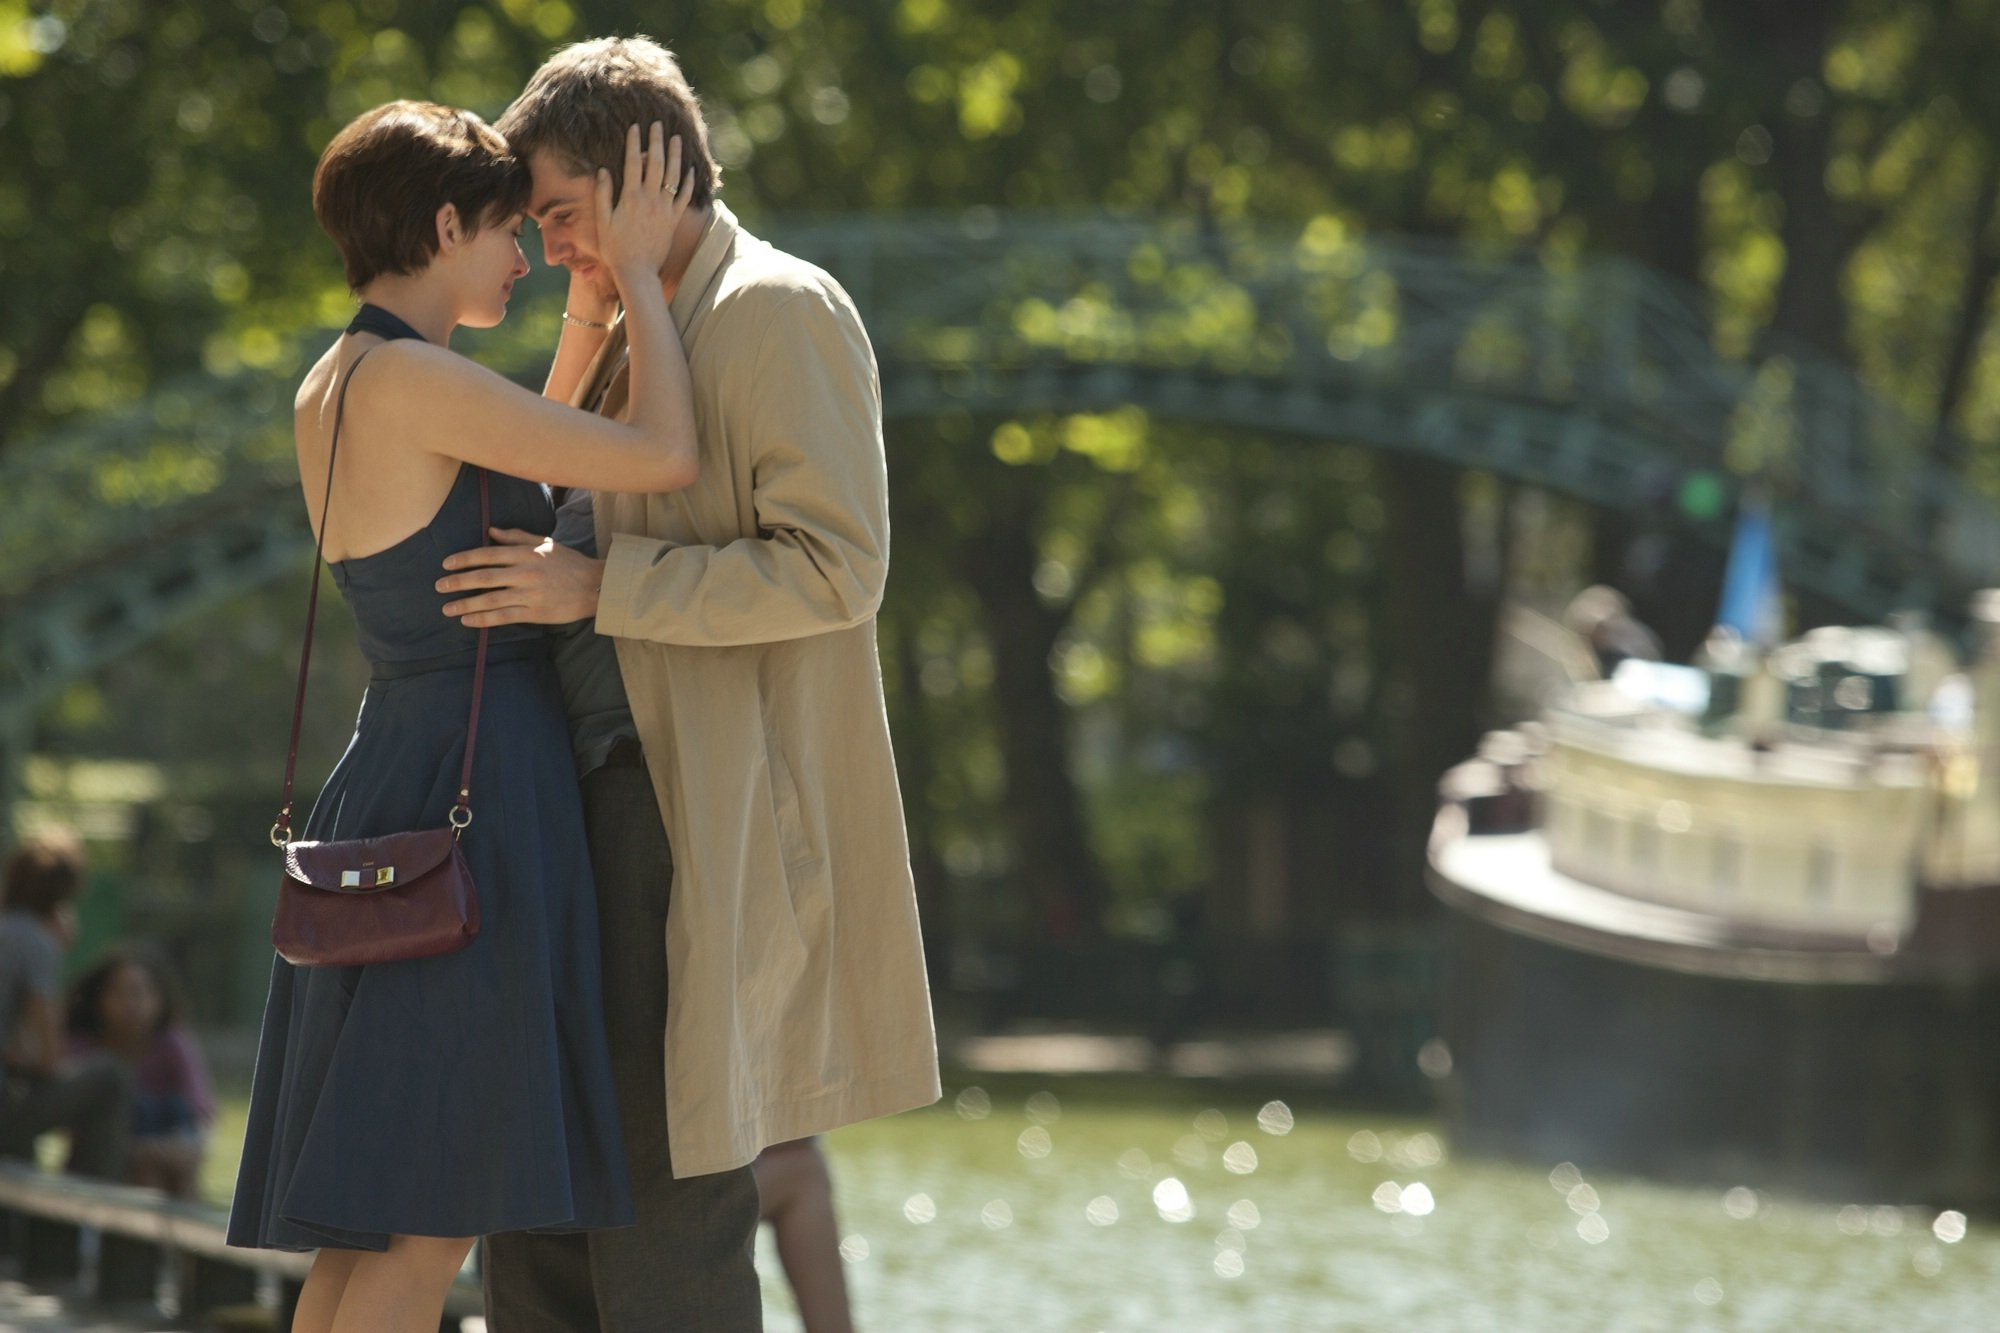 Kenali 4 Kriteria Kekasih yang Layak Untuk Dijadikan Suami